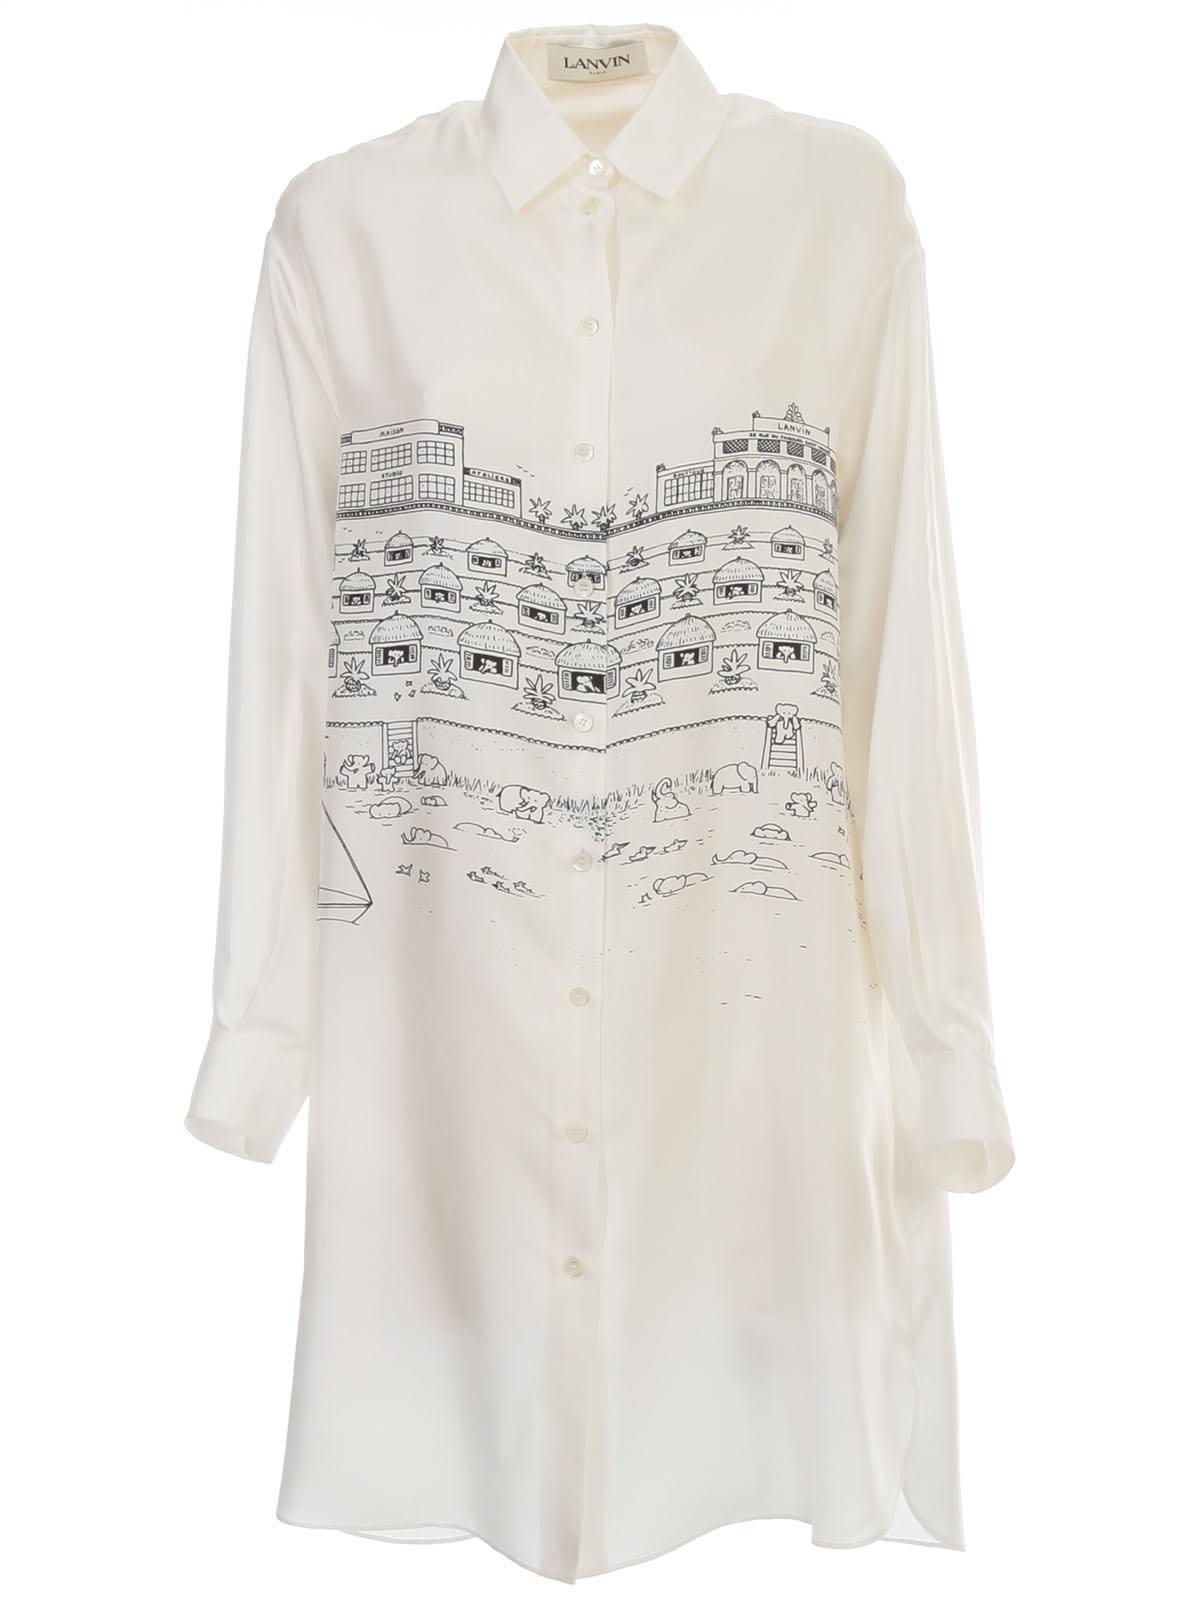 Buy Lanvin Dress L/s Shirt Neck online, shop Lanvin with free shipping